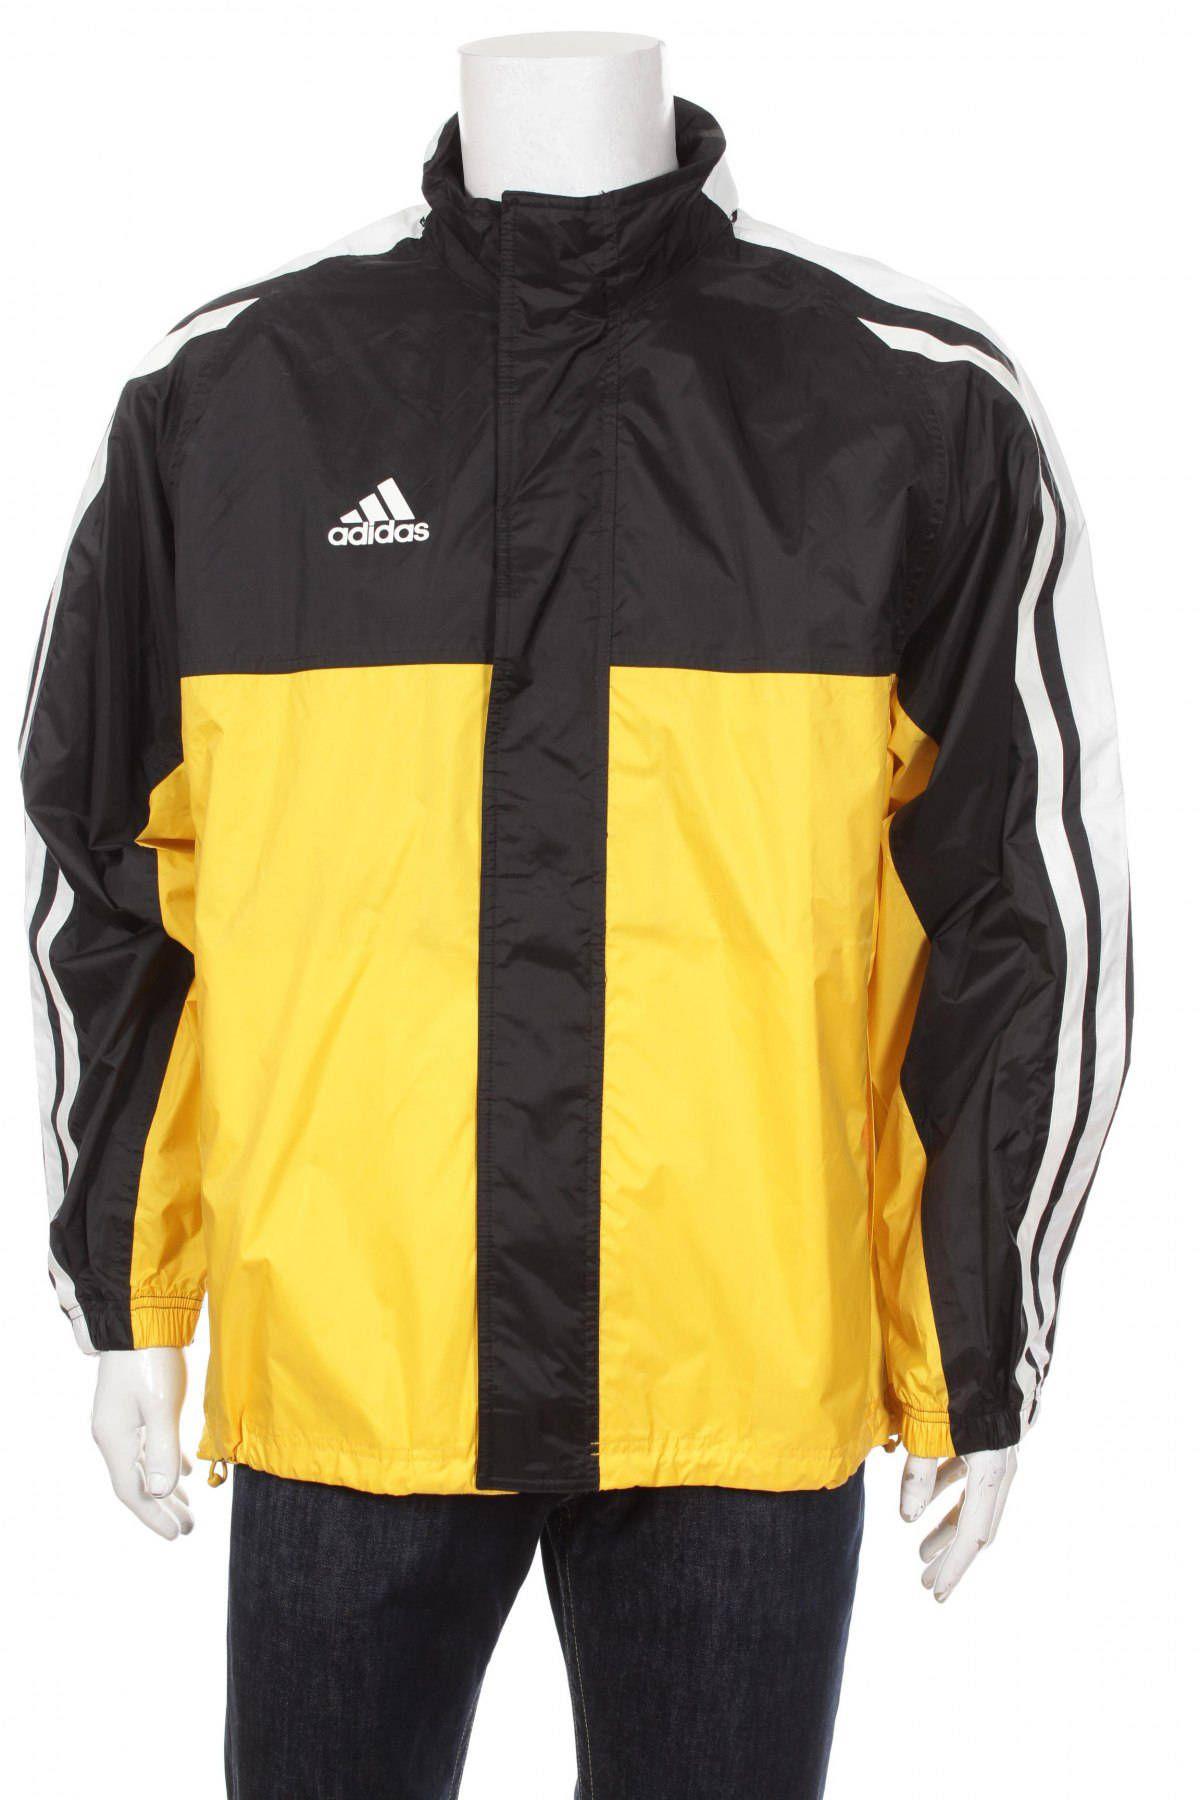 on Hidden by Black Hood Etsy Adidas VapeoVintage 90s Top Vintage Size Yellow jacket Tracksuit Windbreaker White M Zw1xOY